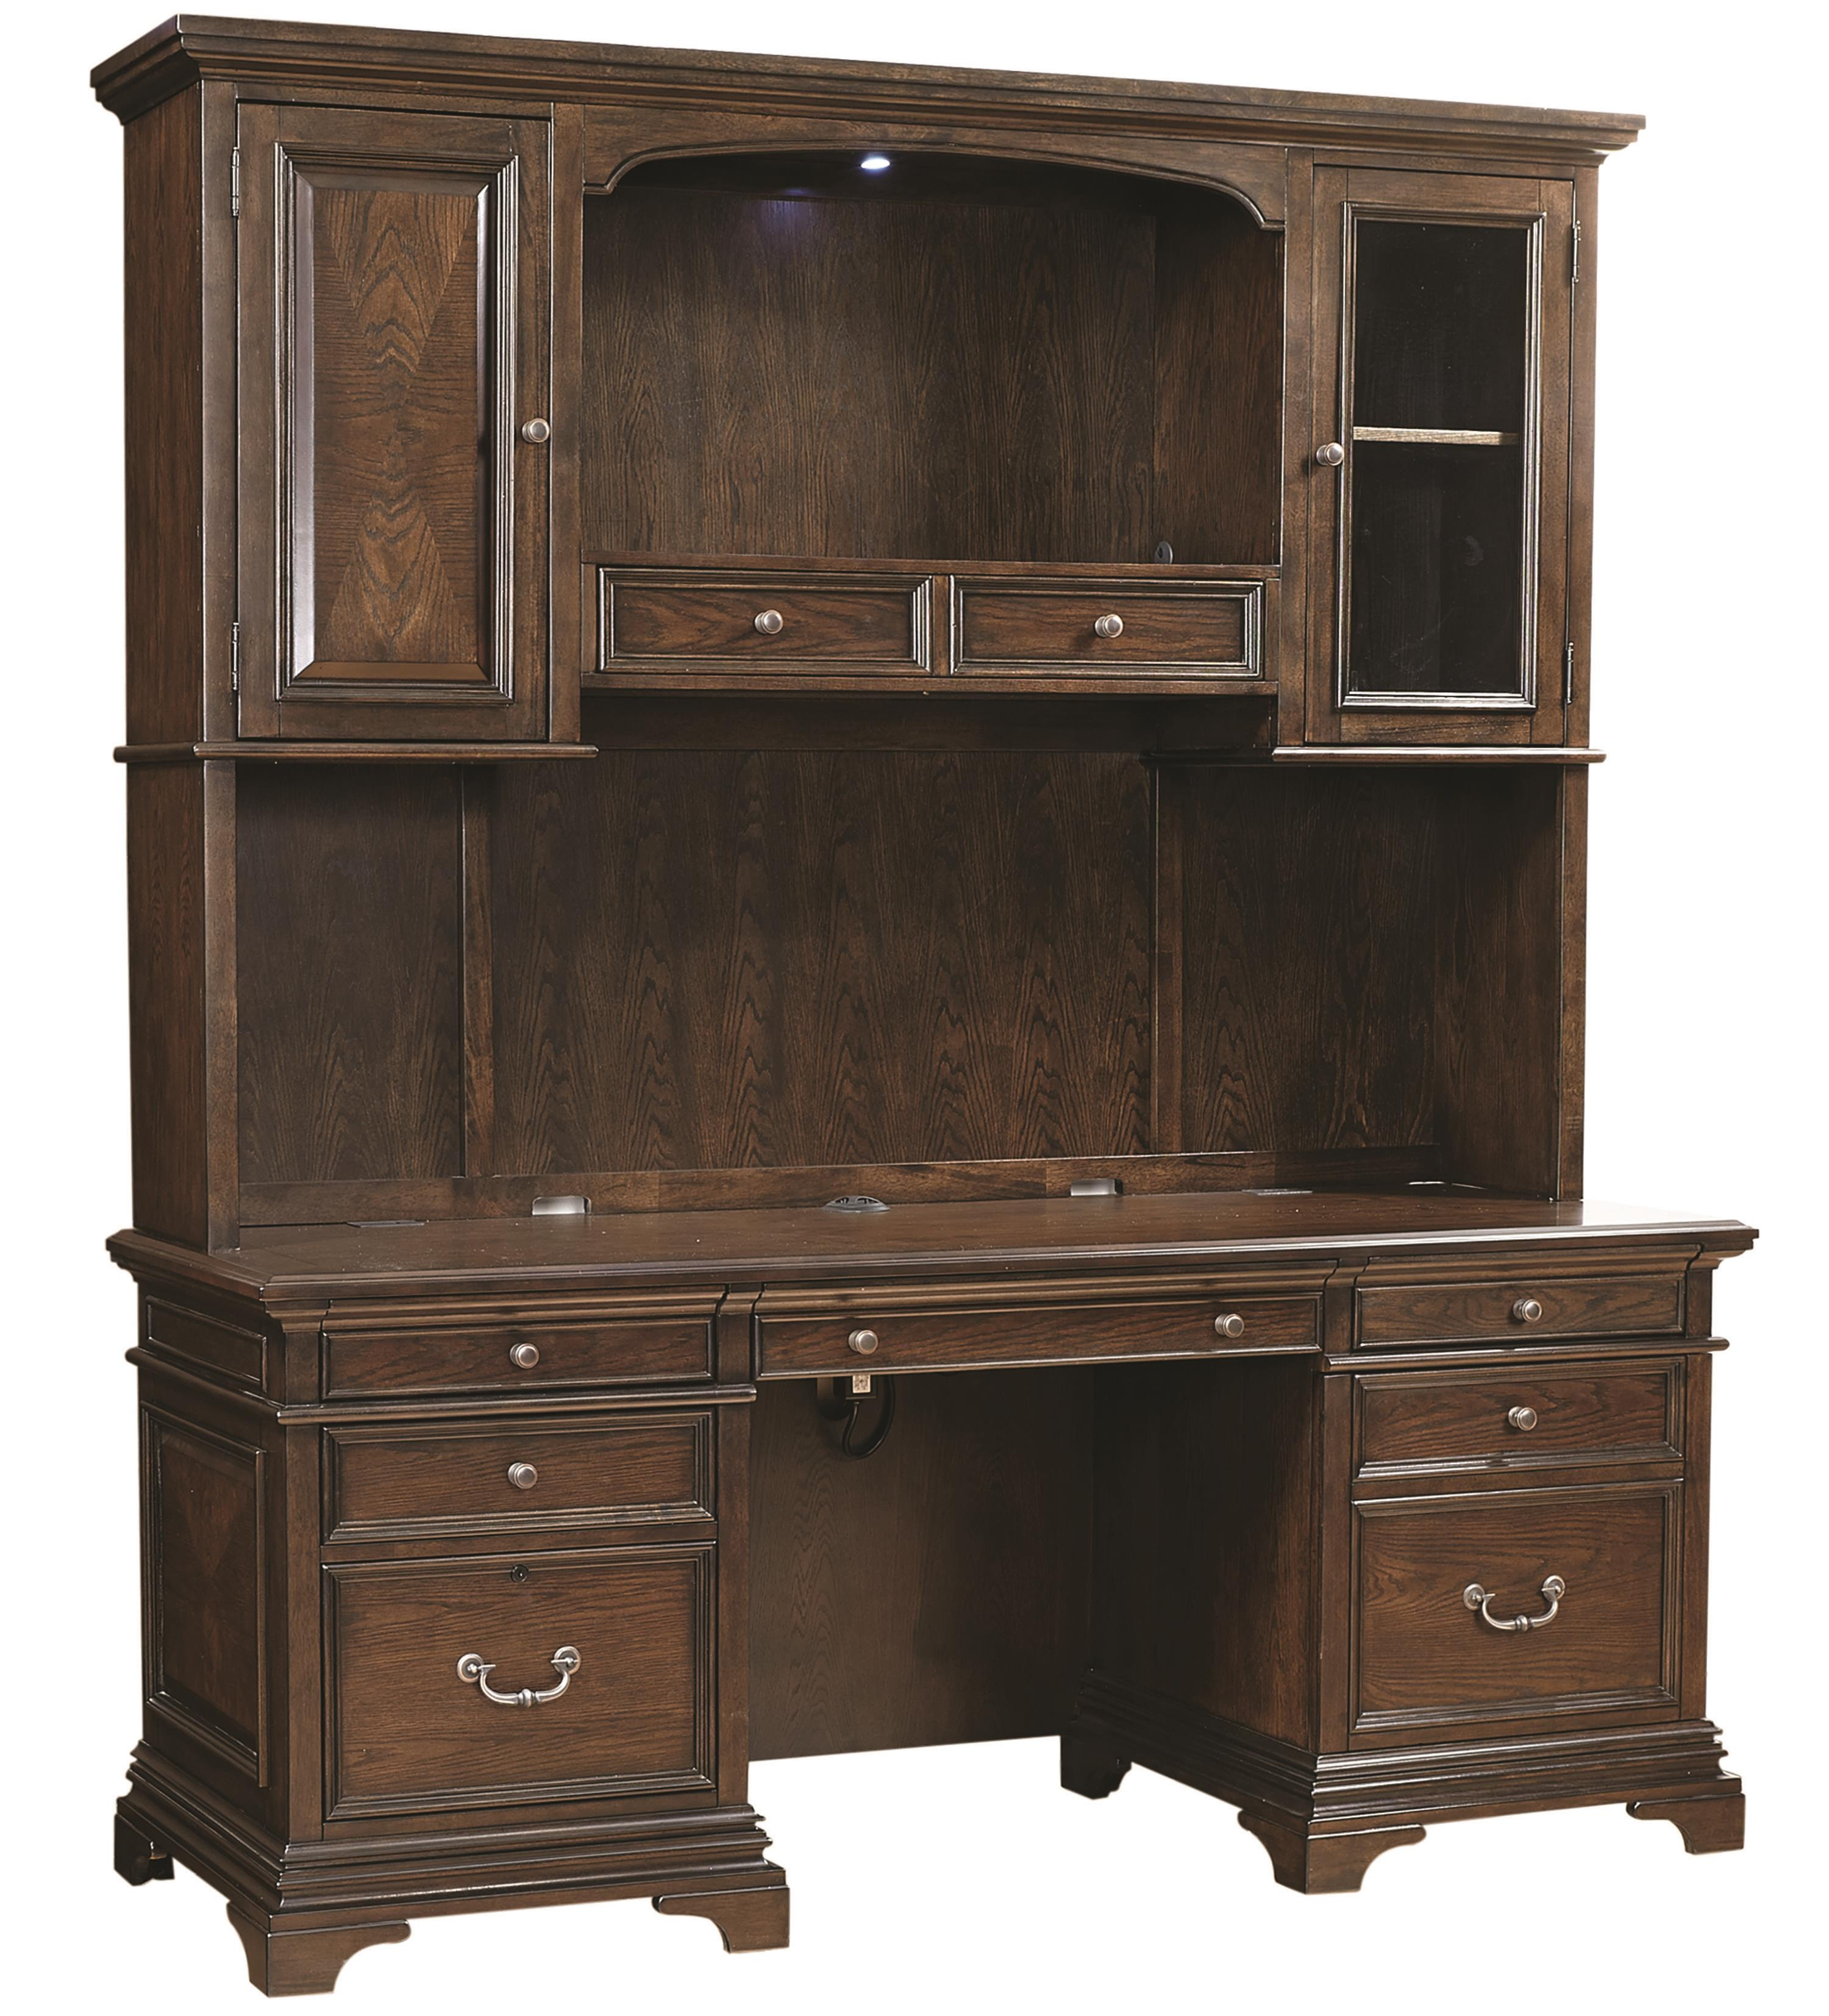 "Aspenhome Essex 75"" Credenza Desk and Hutch - Item Number: I24-318+319"